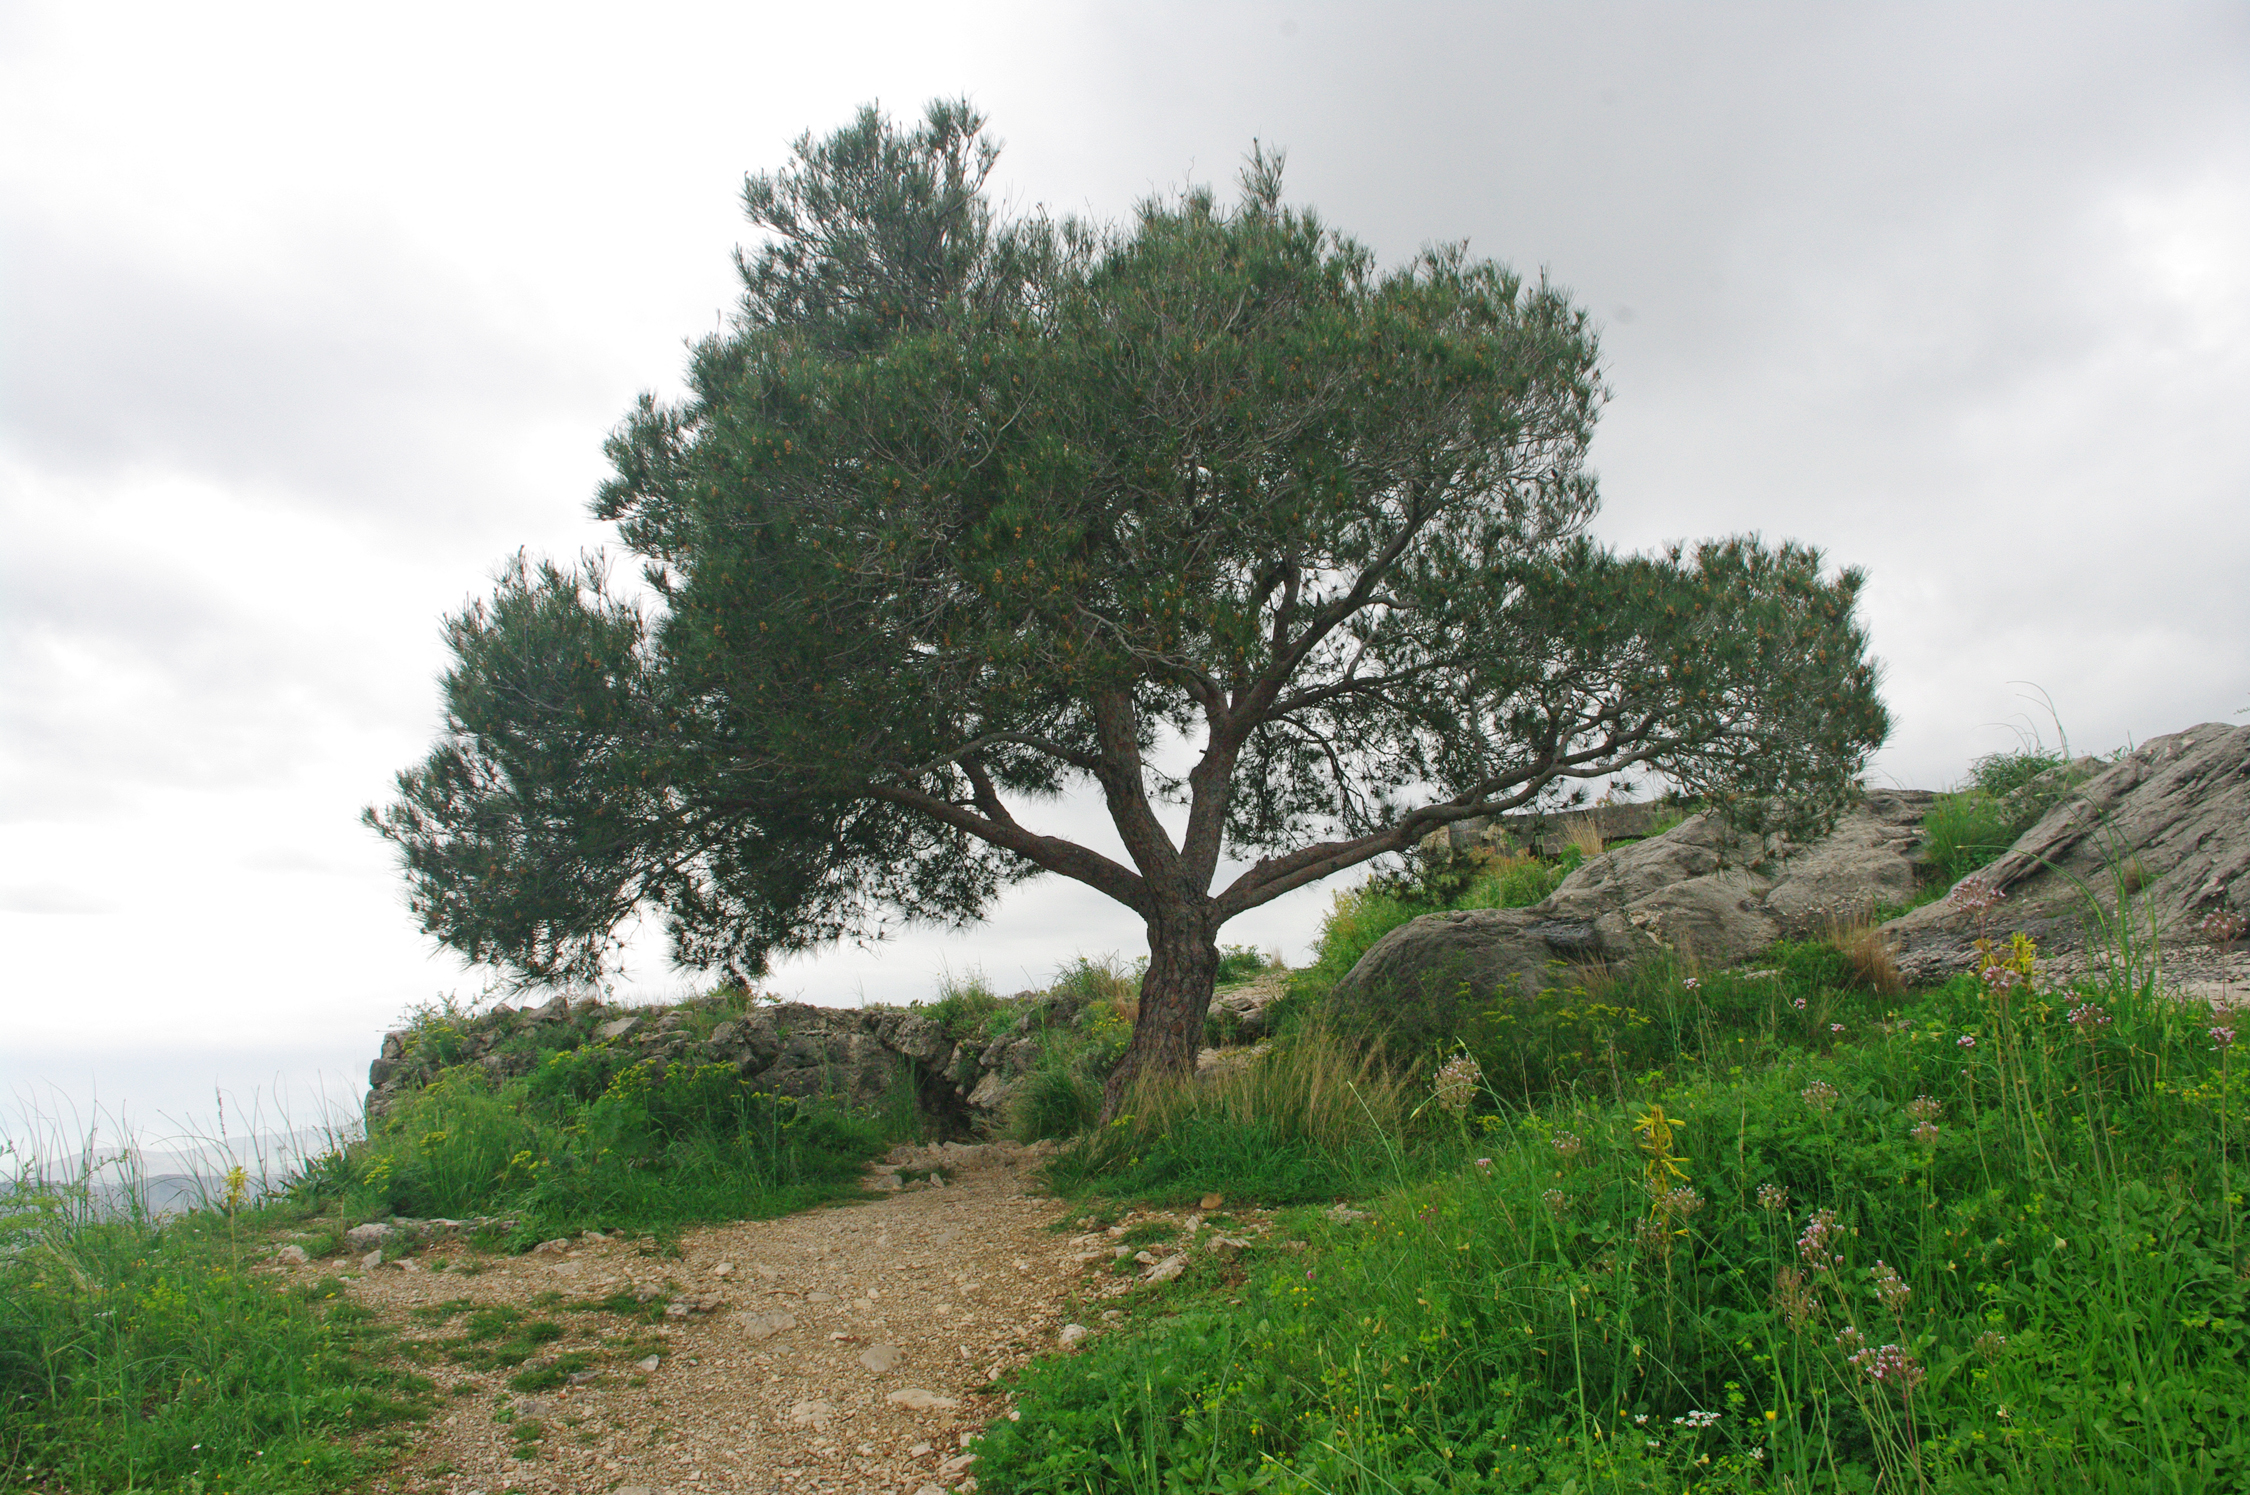 File:Turkish pine, Kozan Castle 02.JPG - Wikimedia Commons